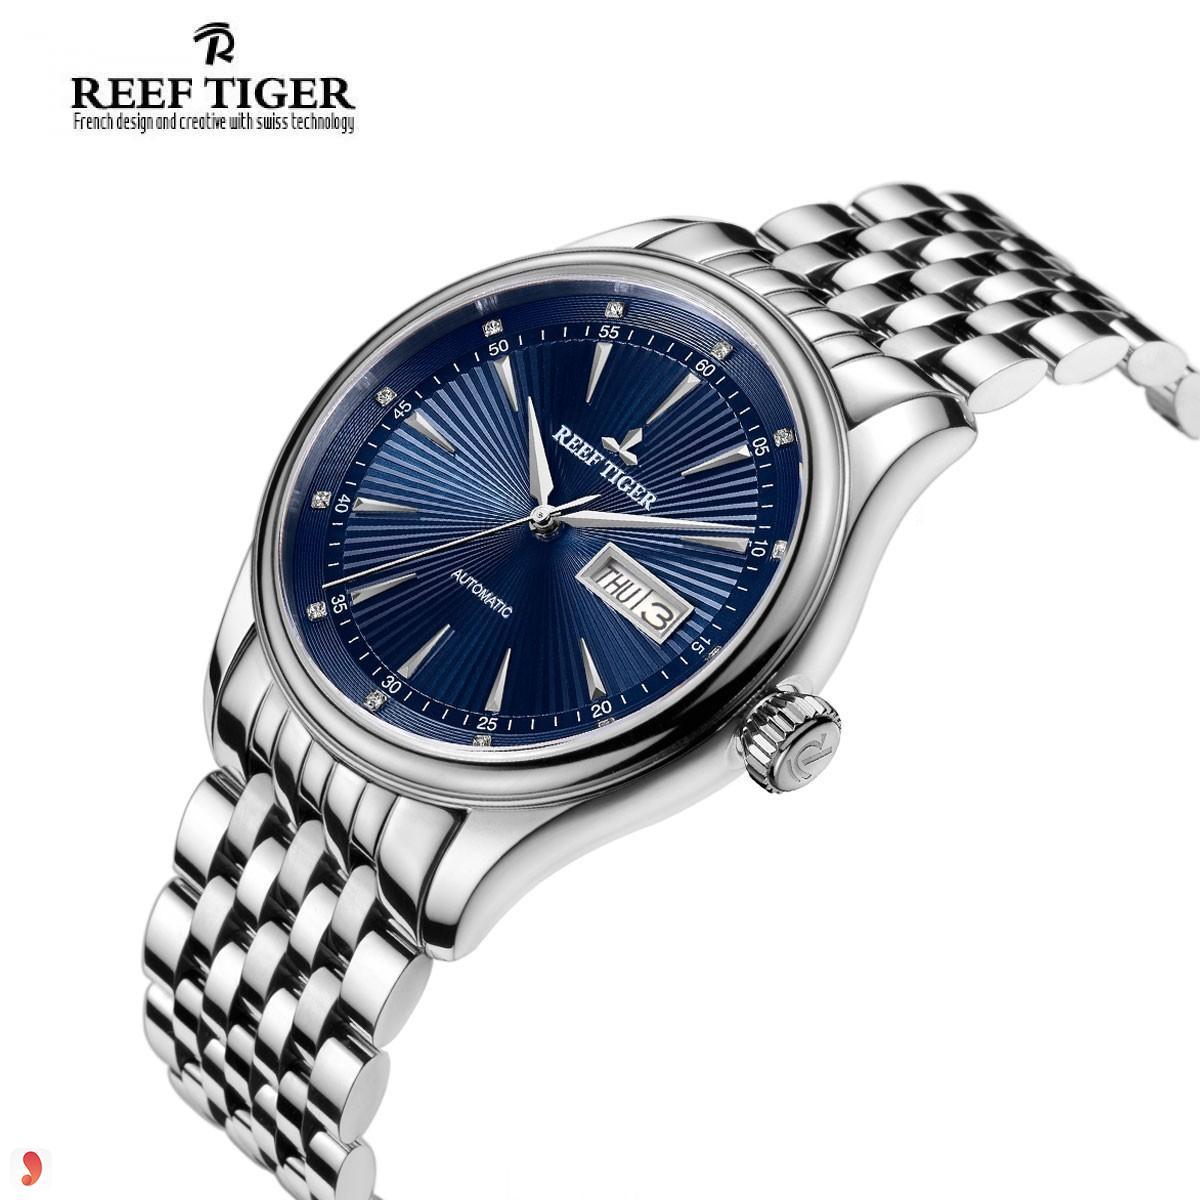 Reef Tiger RGA8232- YLY 1